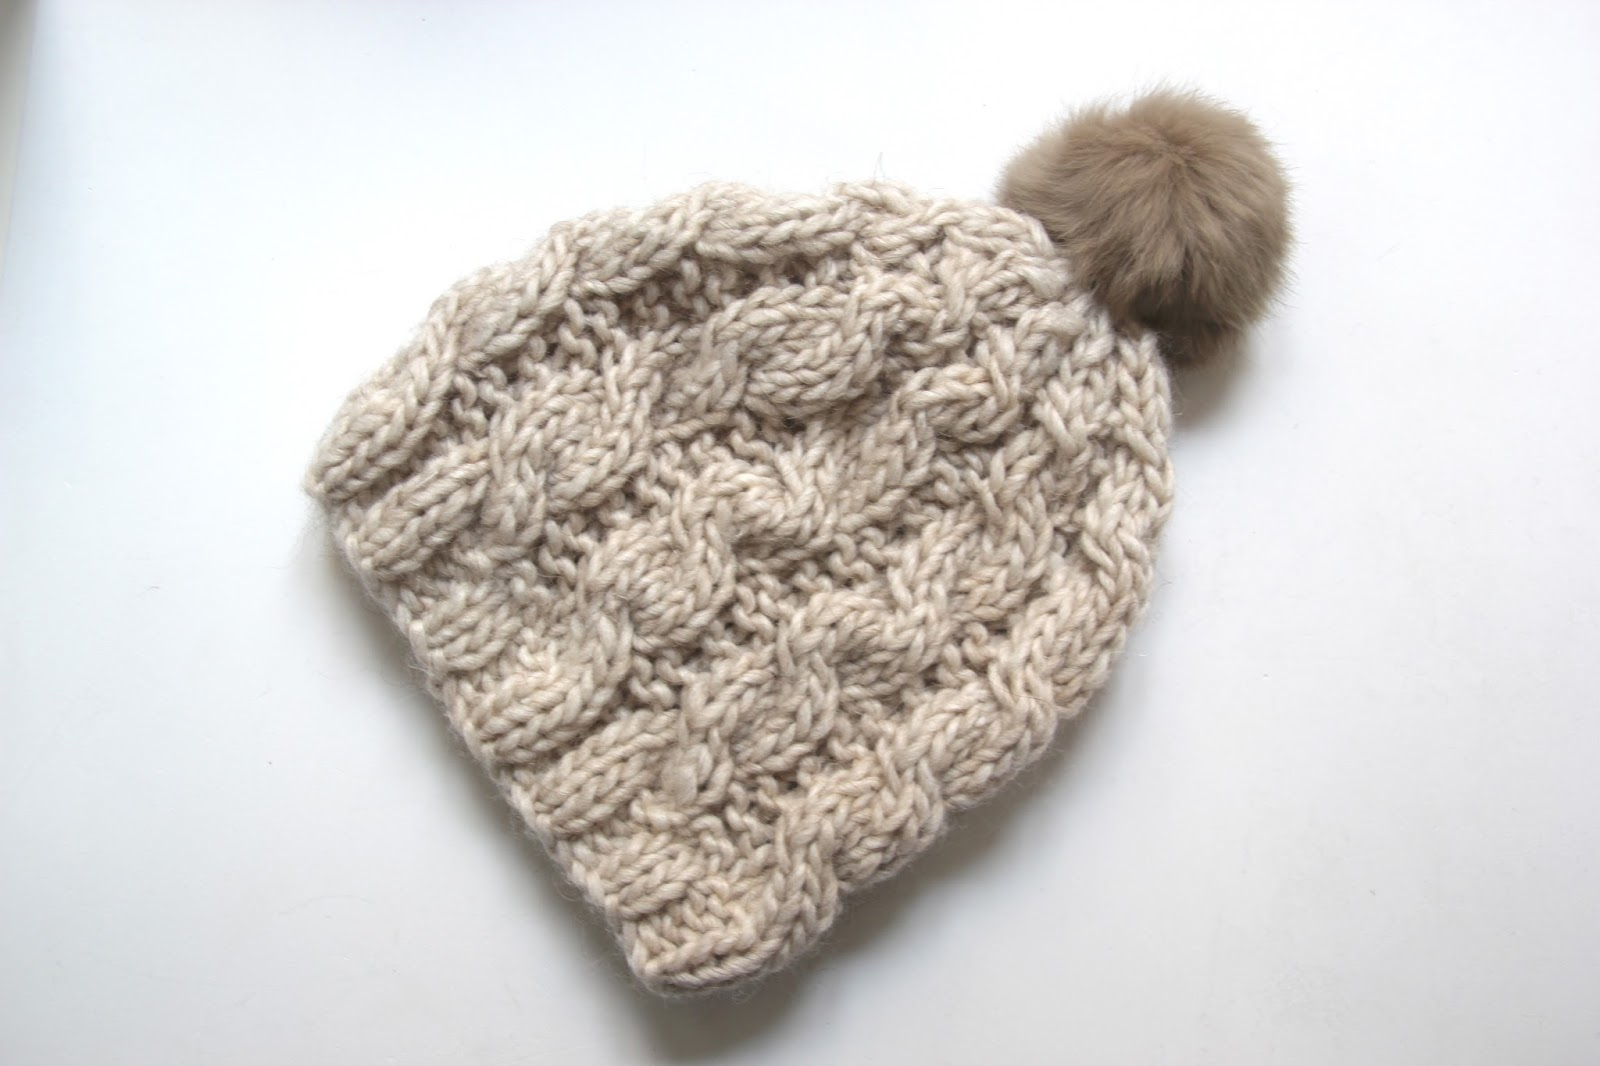 bf117c21e05f0 Tutorial de lana  Como hacer gorro trenzado (patrones gratis)